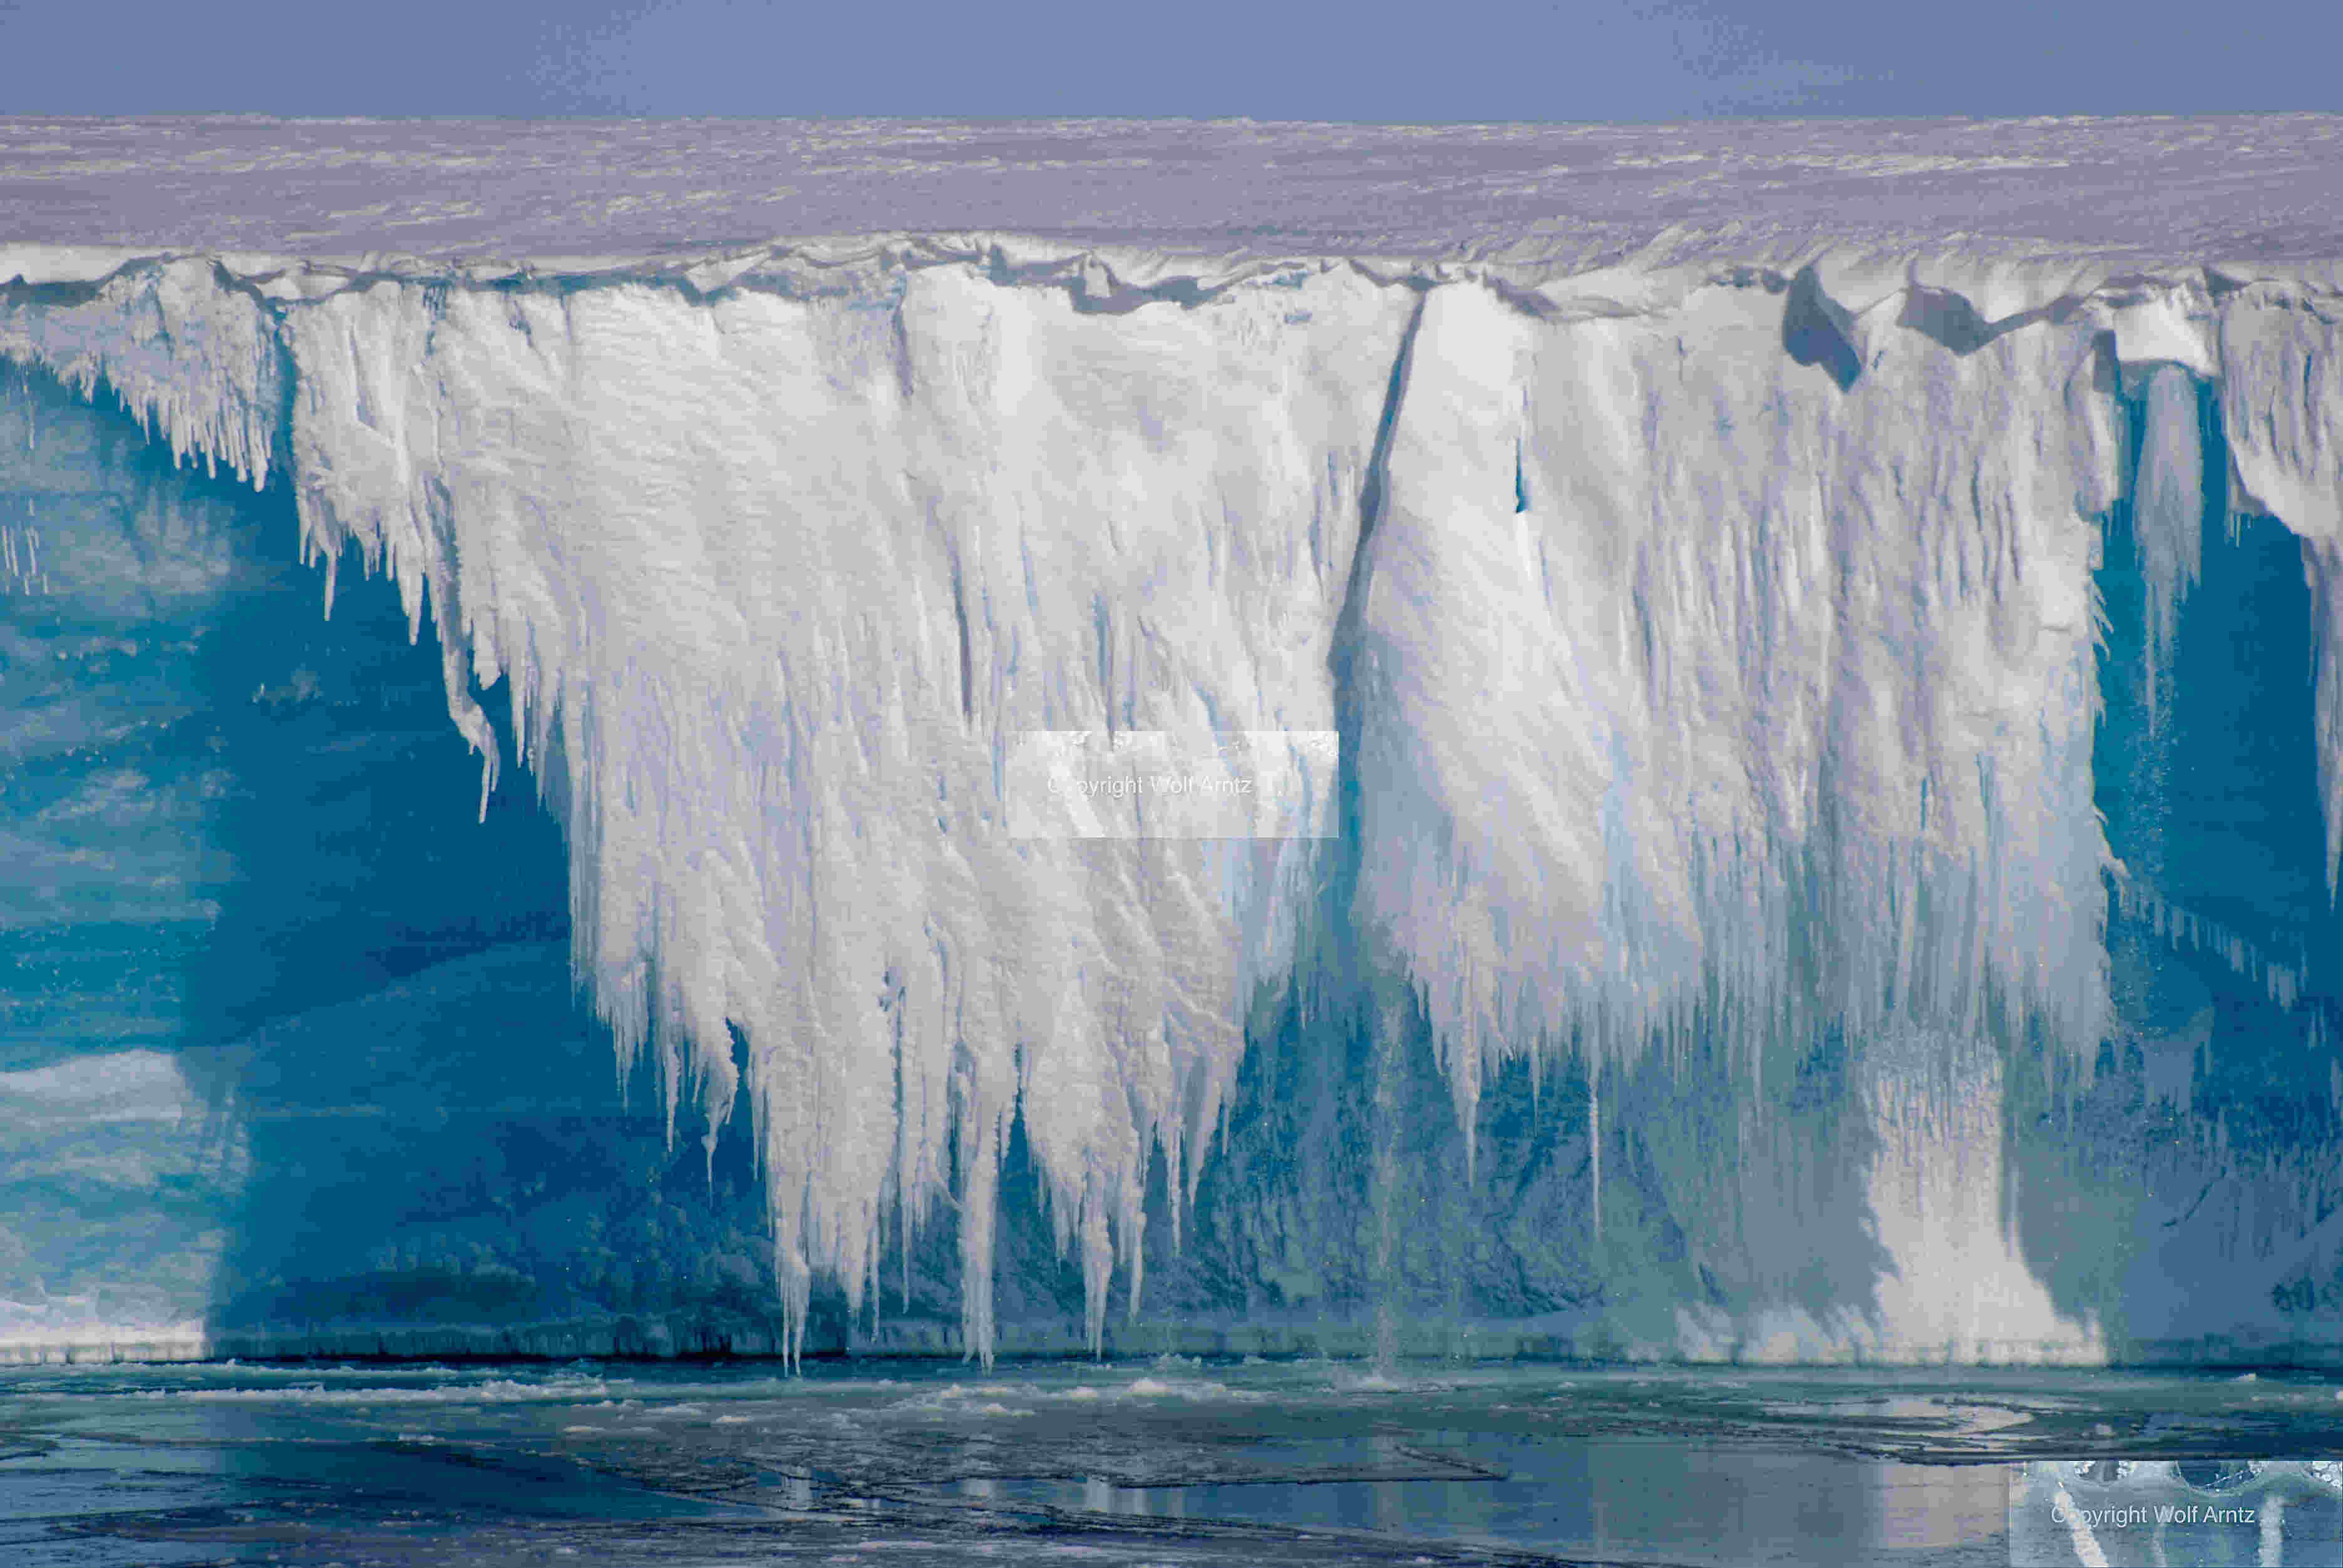 """Petzi"" – Antarktikreisender – ein paar Photos | Post aus ..."